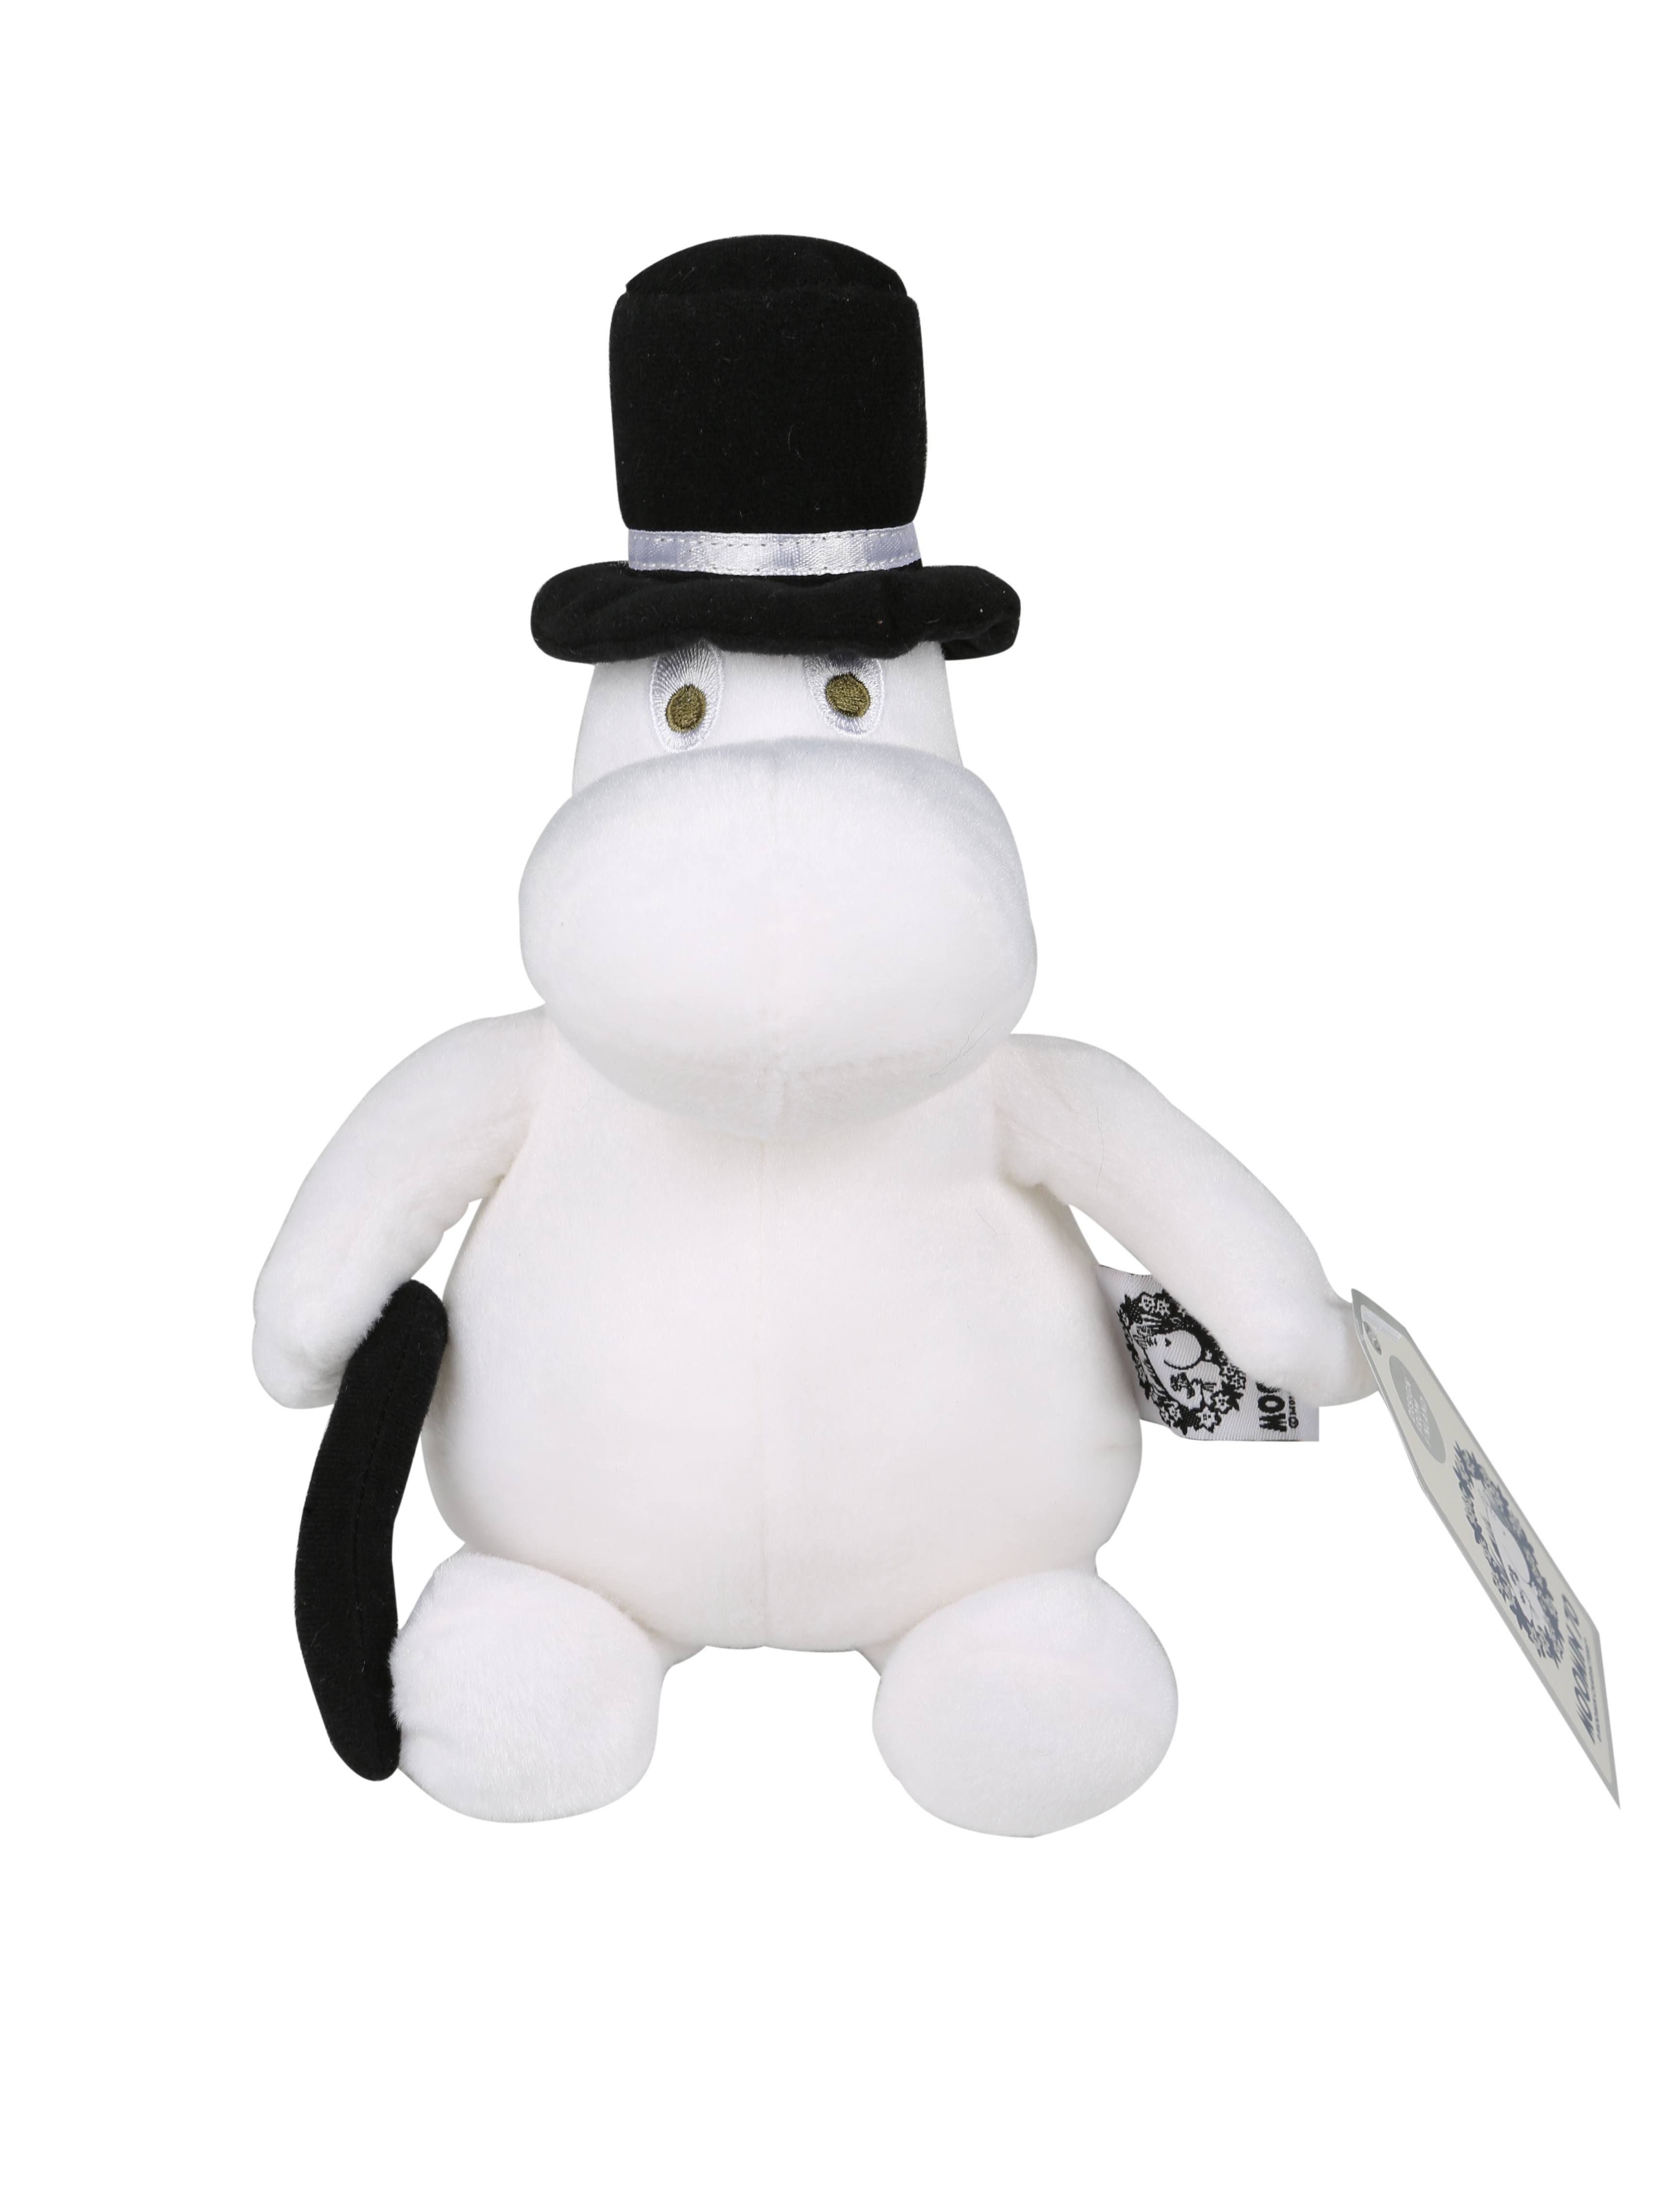 Martinex 70 year celebration Moominpappa plush toy 22cm